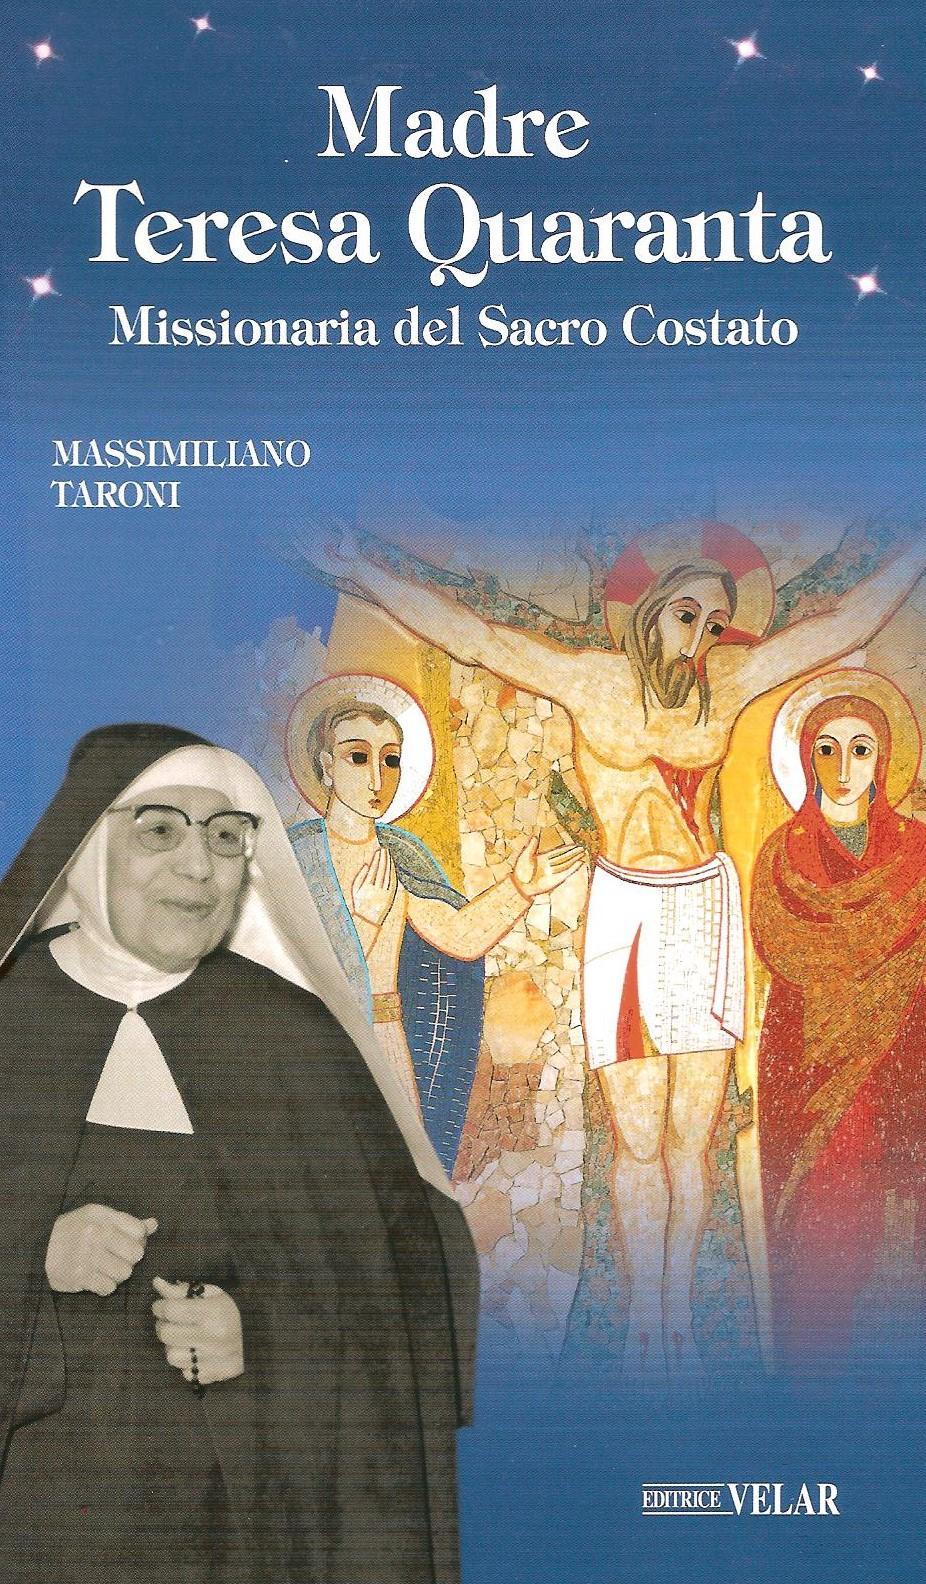 Madre Teresa Quaranta Missionaria del Sacro Costato